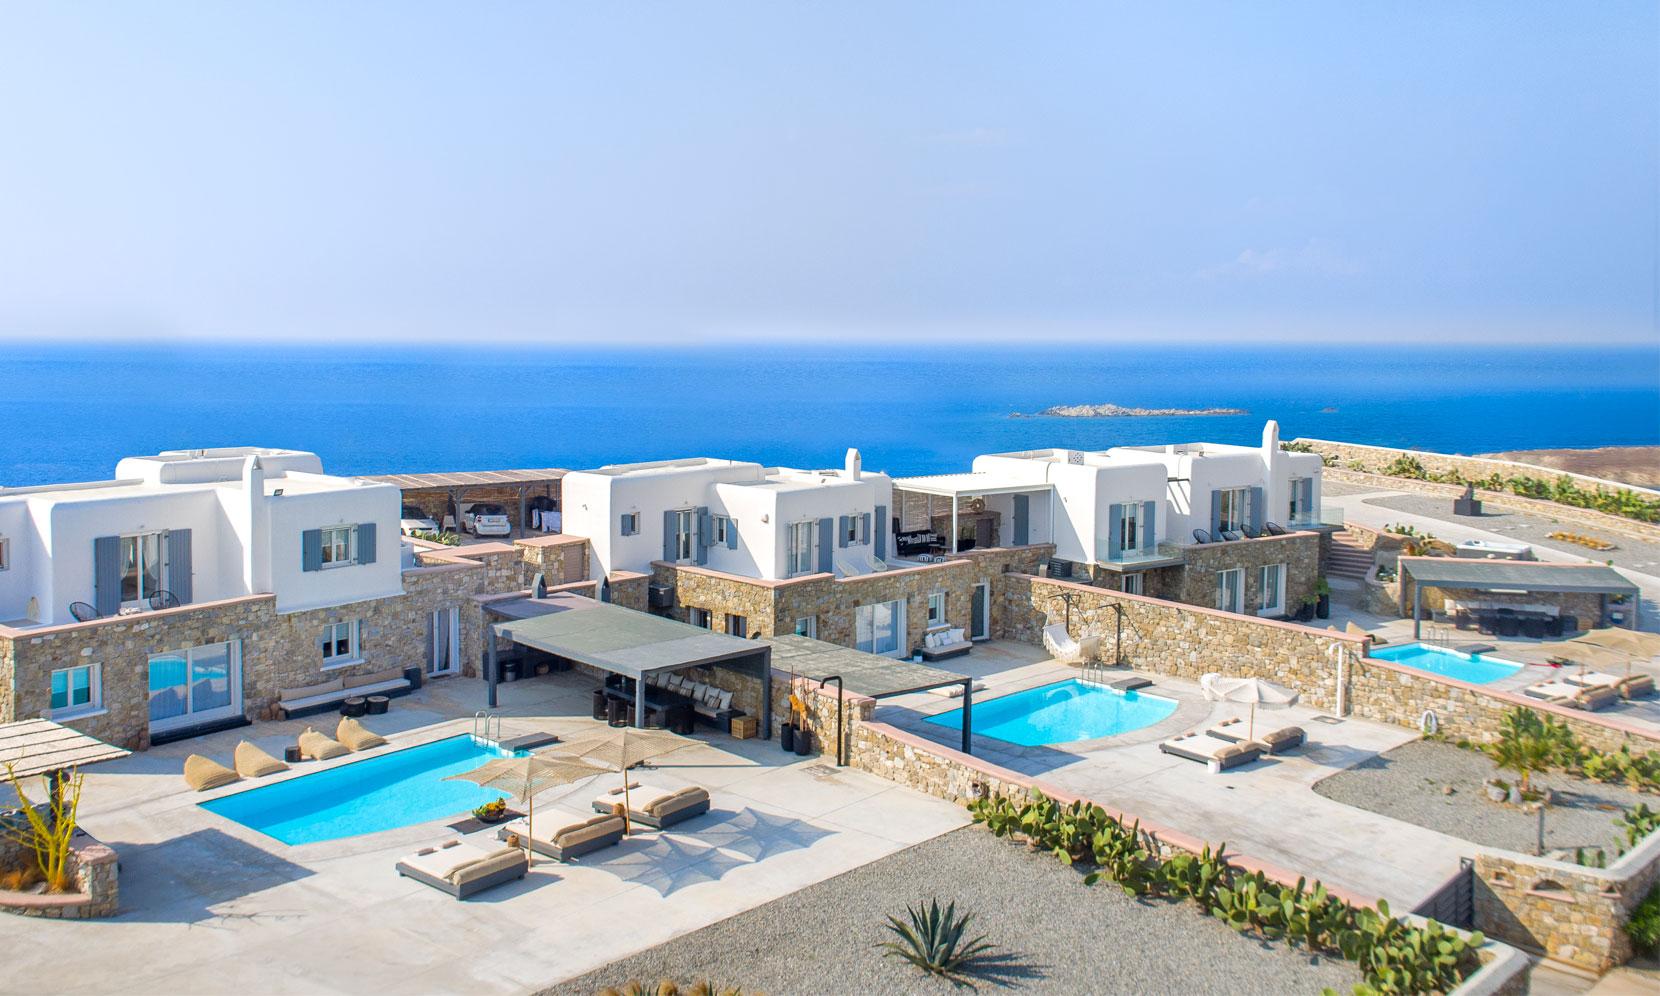 Mykonos Villa Aqua Retreat jumbotron image